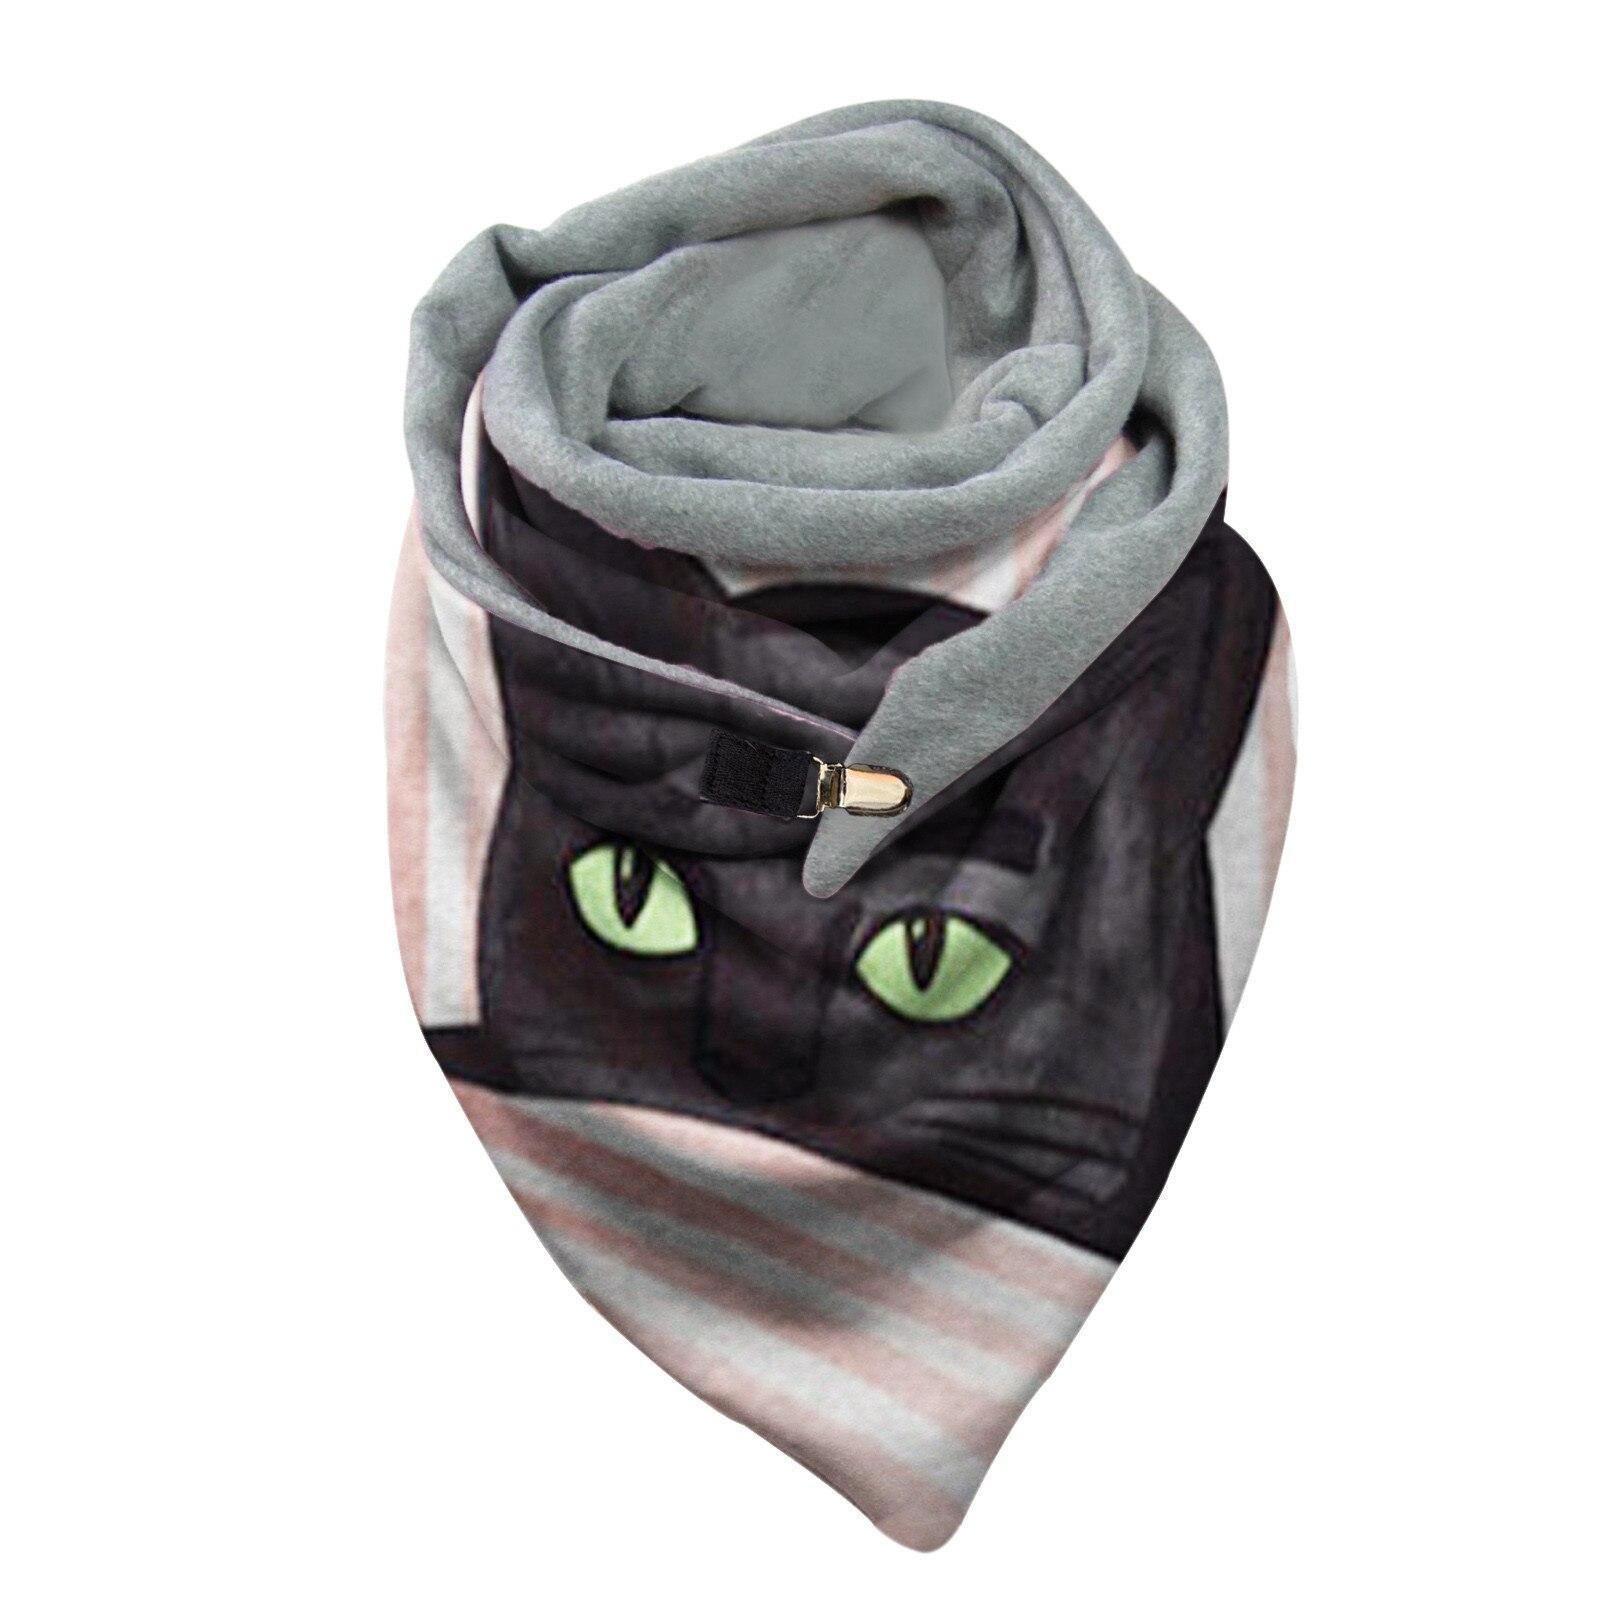 2020 Luxury Fashion Scarf Women 3Cat Printing Button Soft Wrap Casual Warm Scarves Shawls FoularFemme Шарф